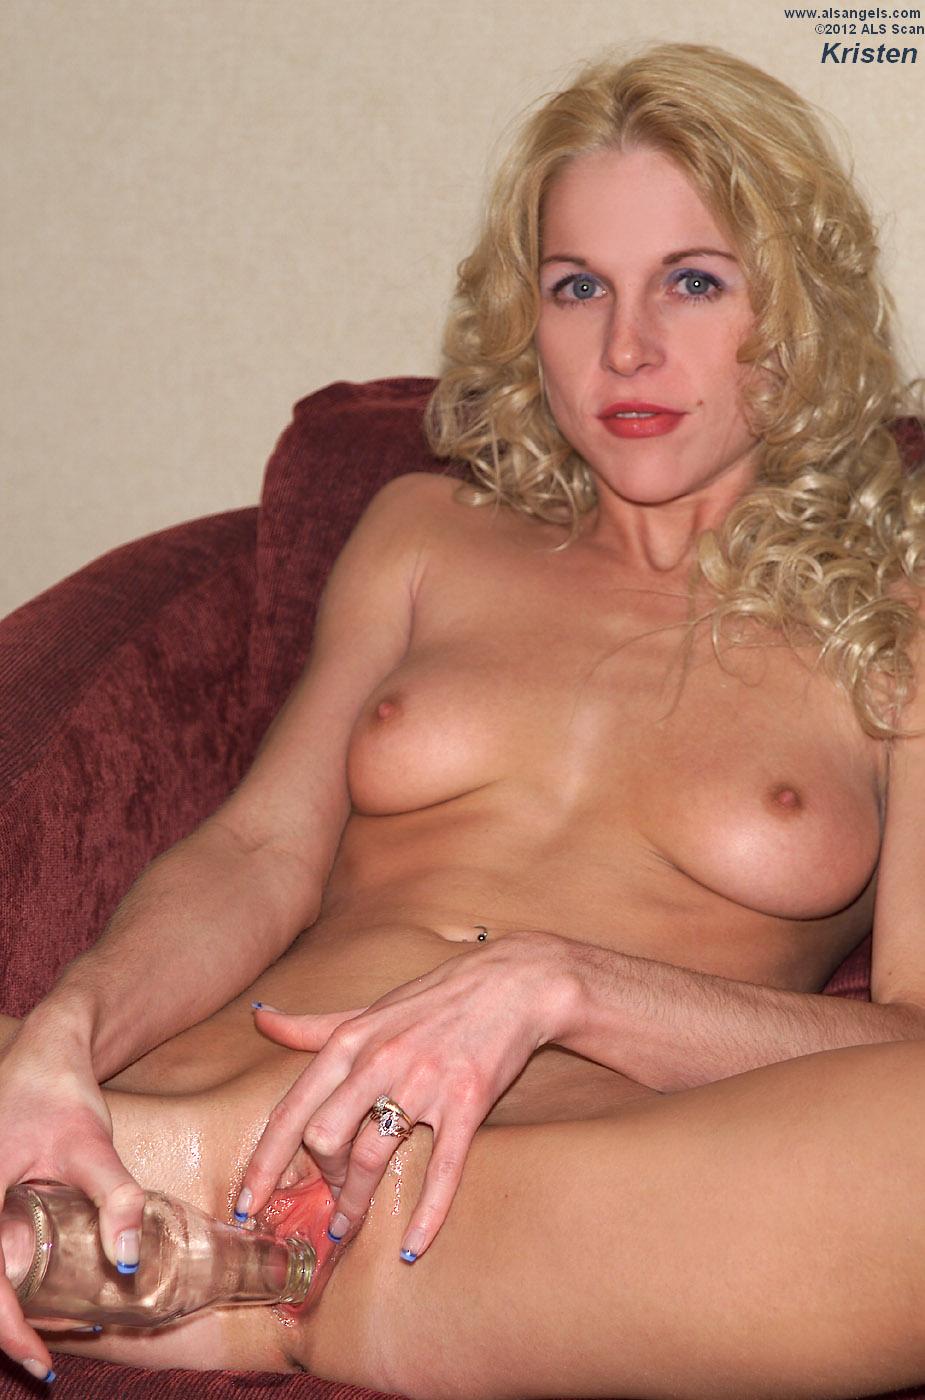 Rebecca ferguson white queen hot